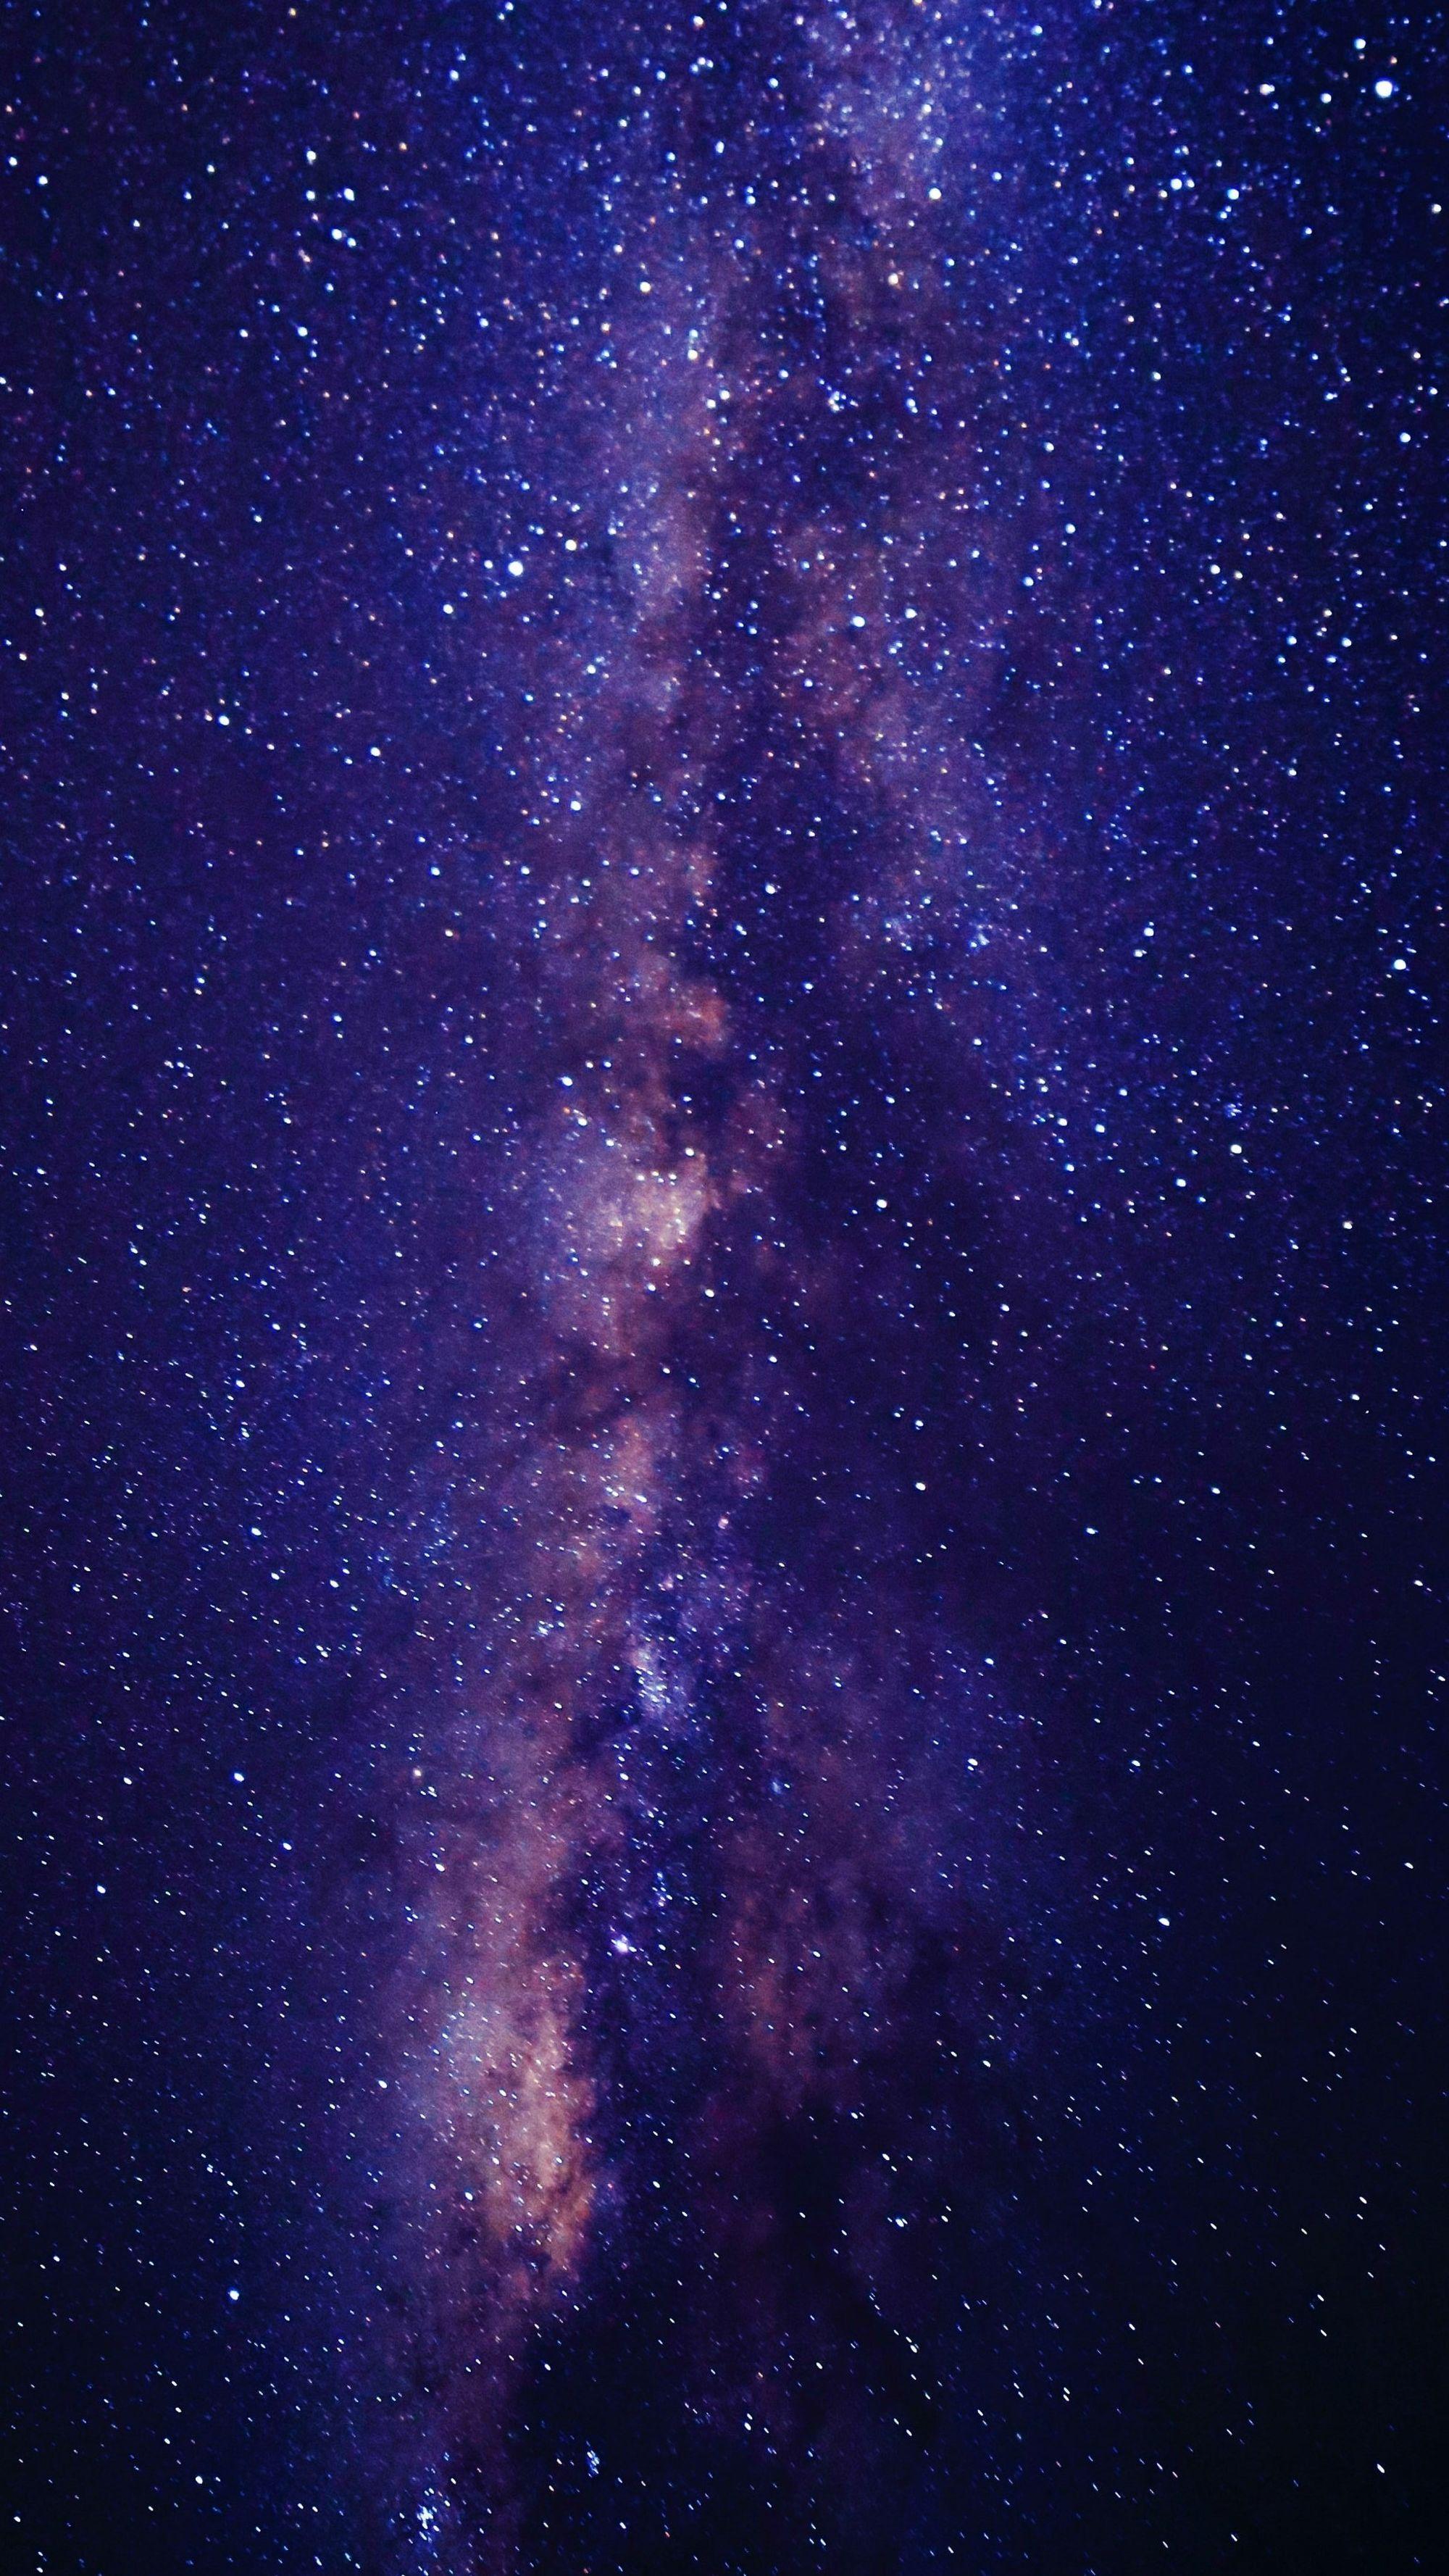 Interesting Design Galaxy Wallpaper 4k Image Space Hd Galaxy Wallpaper 4k Is Hd Wallpapers Backgrou Hd Galaxy Wallpaper Galaxy Wallpaper Space Wallpaper 4k